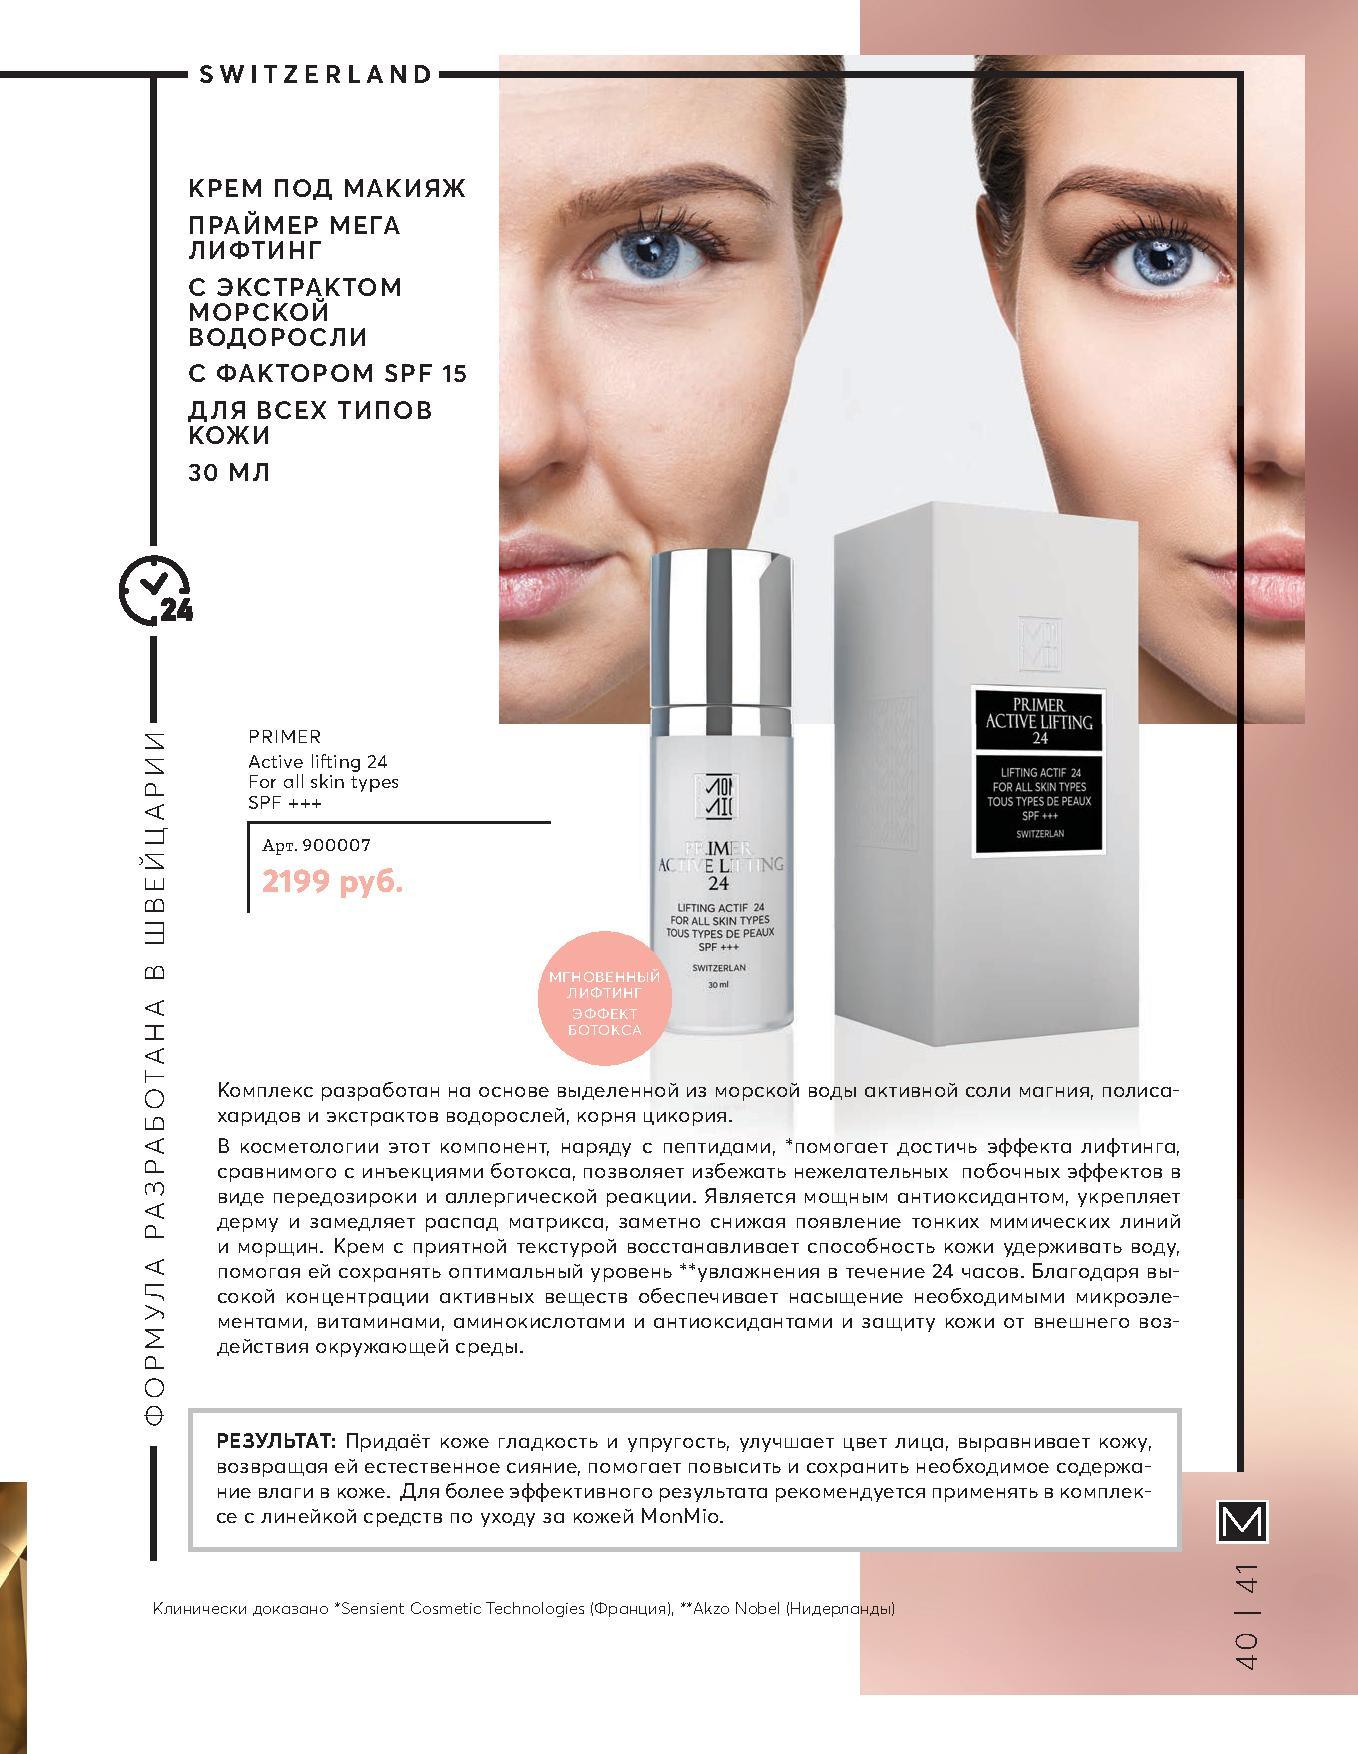 картинка крем под макияж праймер каталог МонМио осень-зима 2018-2019